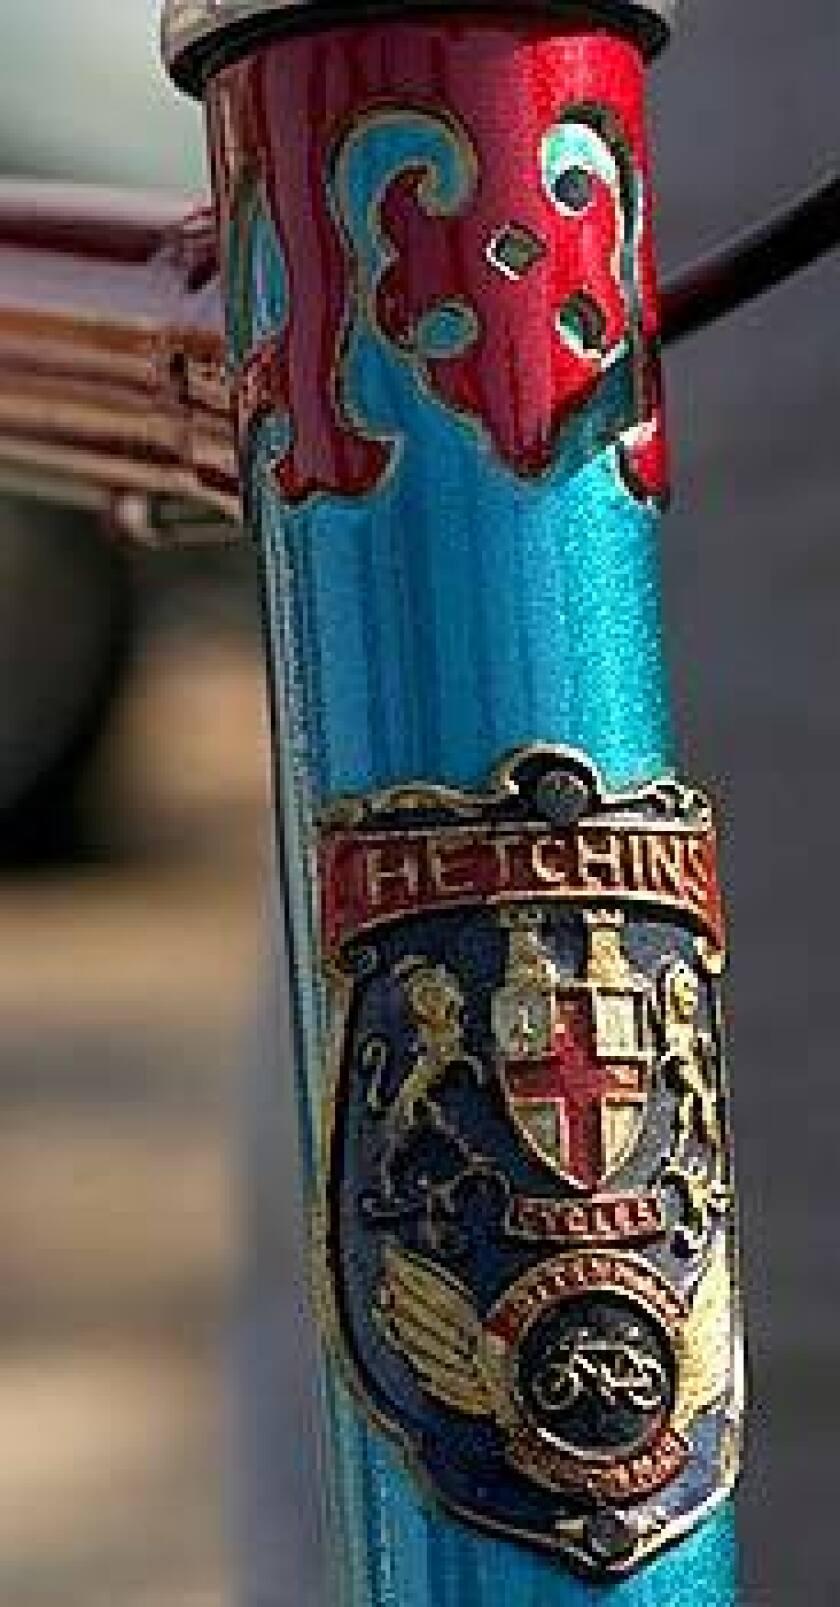 A 1981 Hetchins.